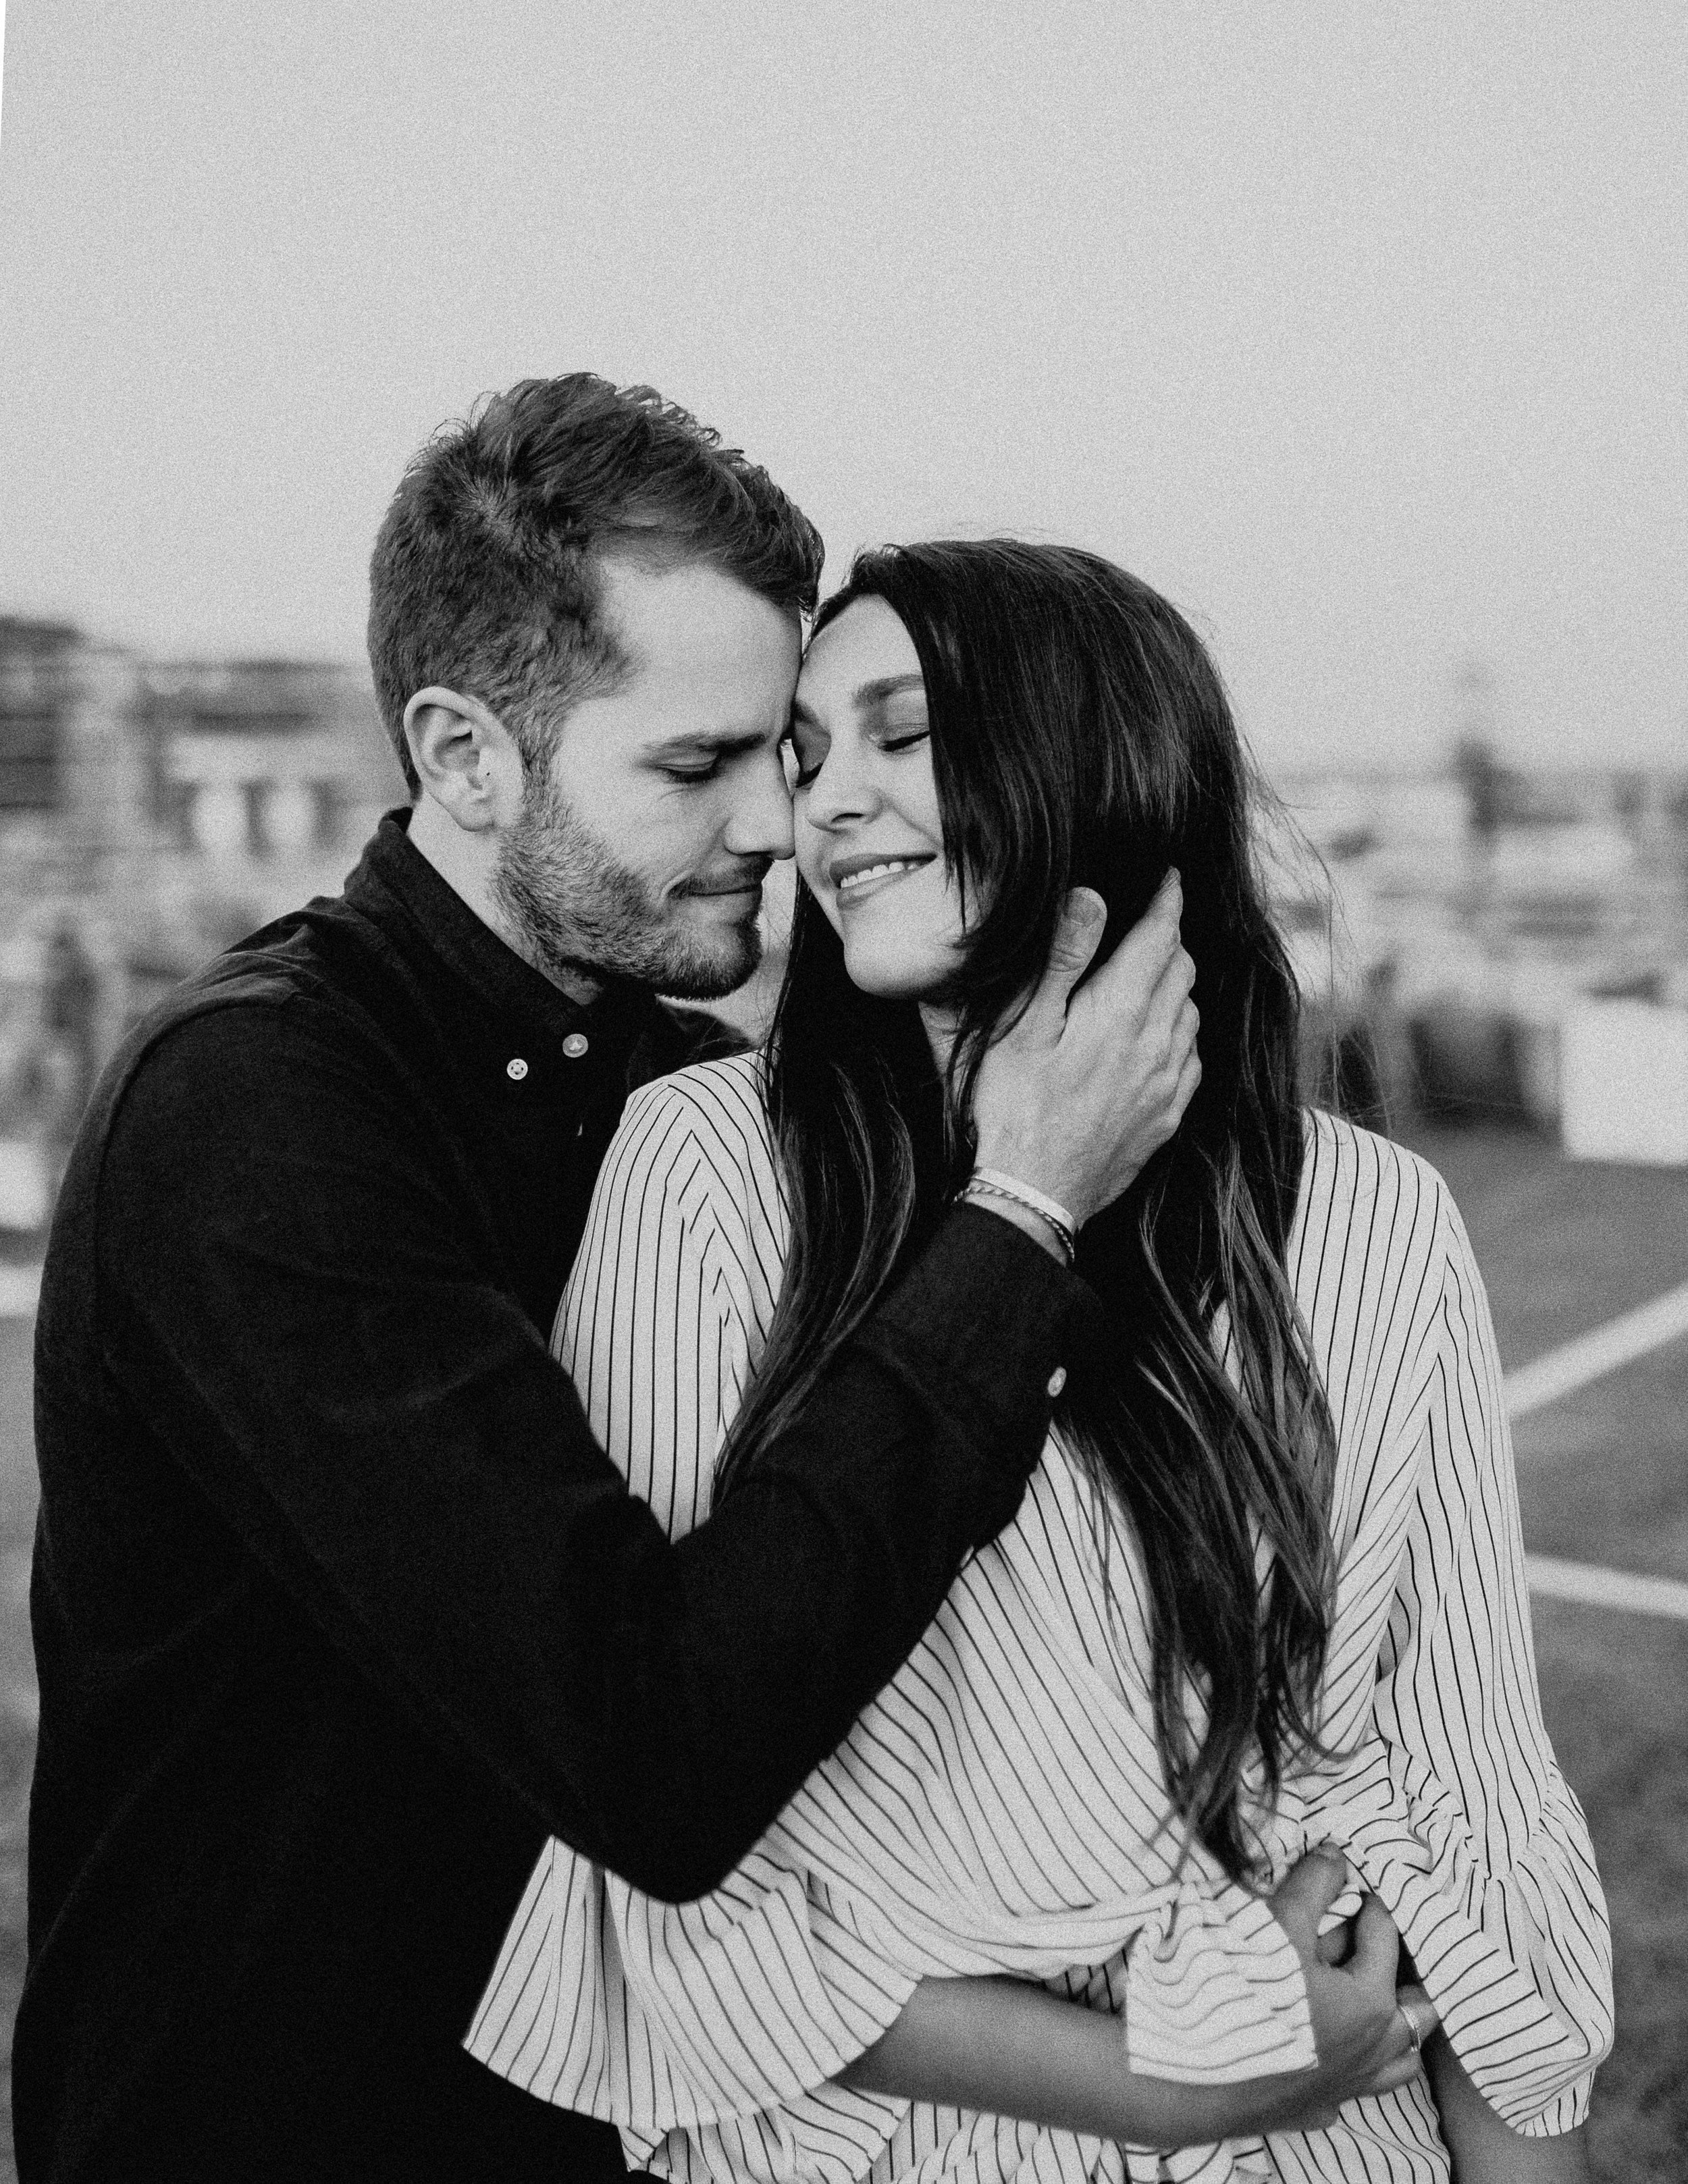 2018September_EmilyandTyler_Engaged_HighRes0235.JPG